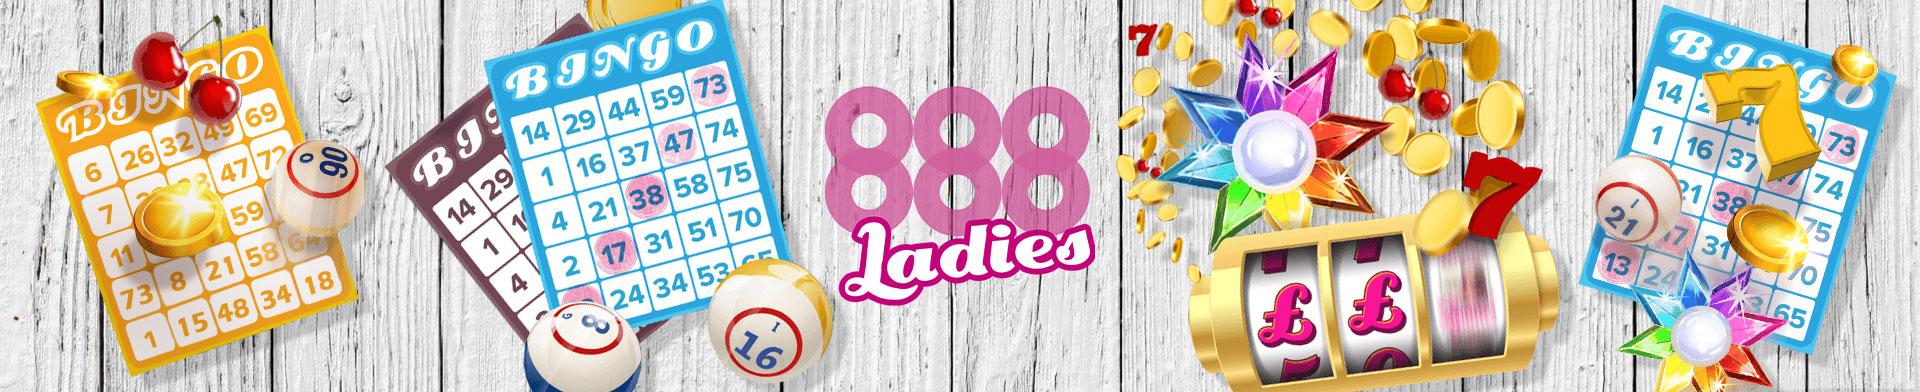 888ladies bingo banner